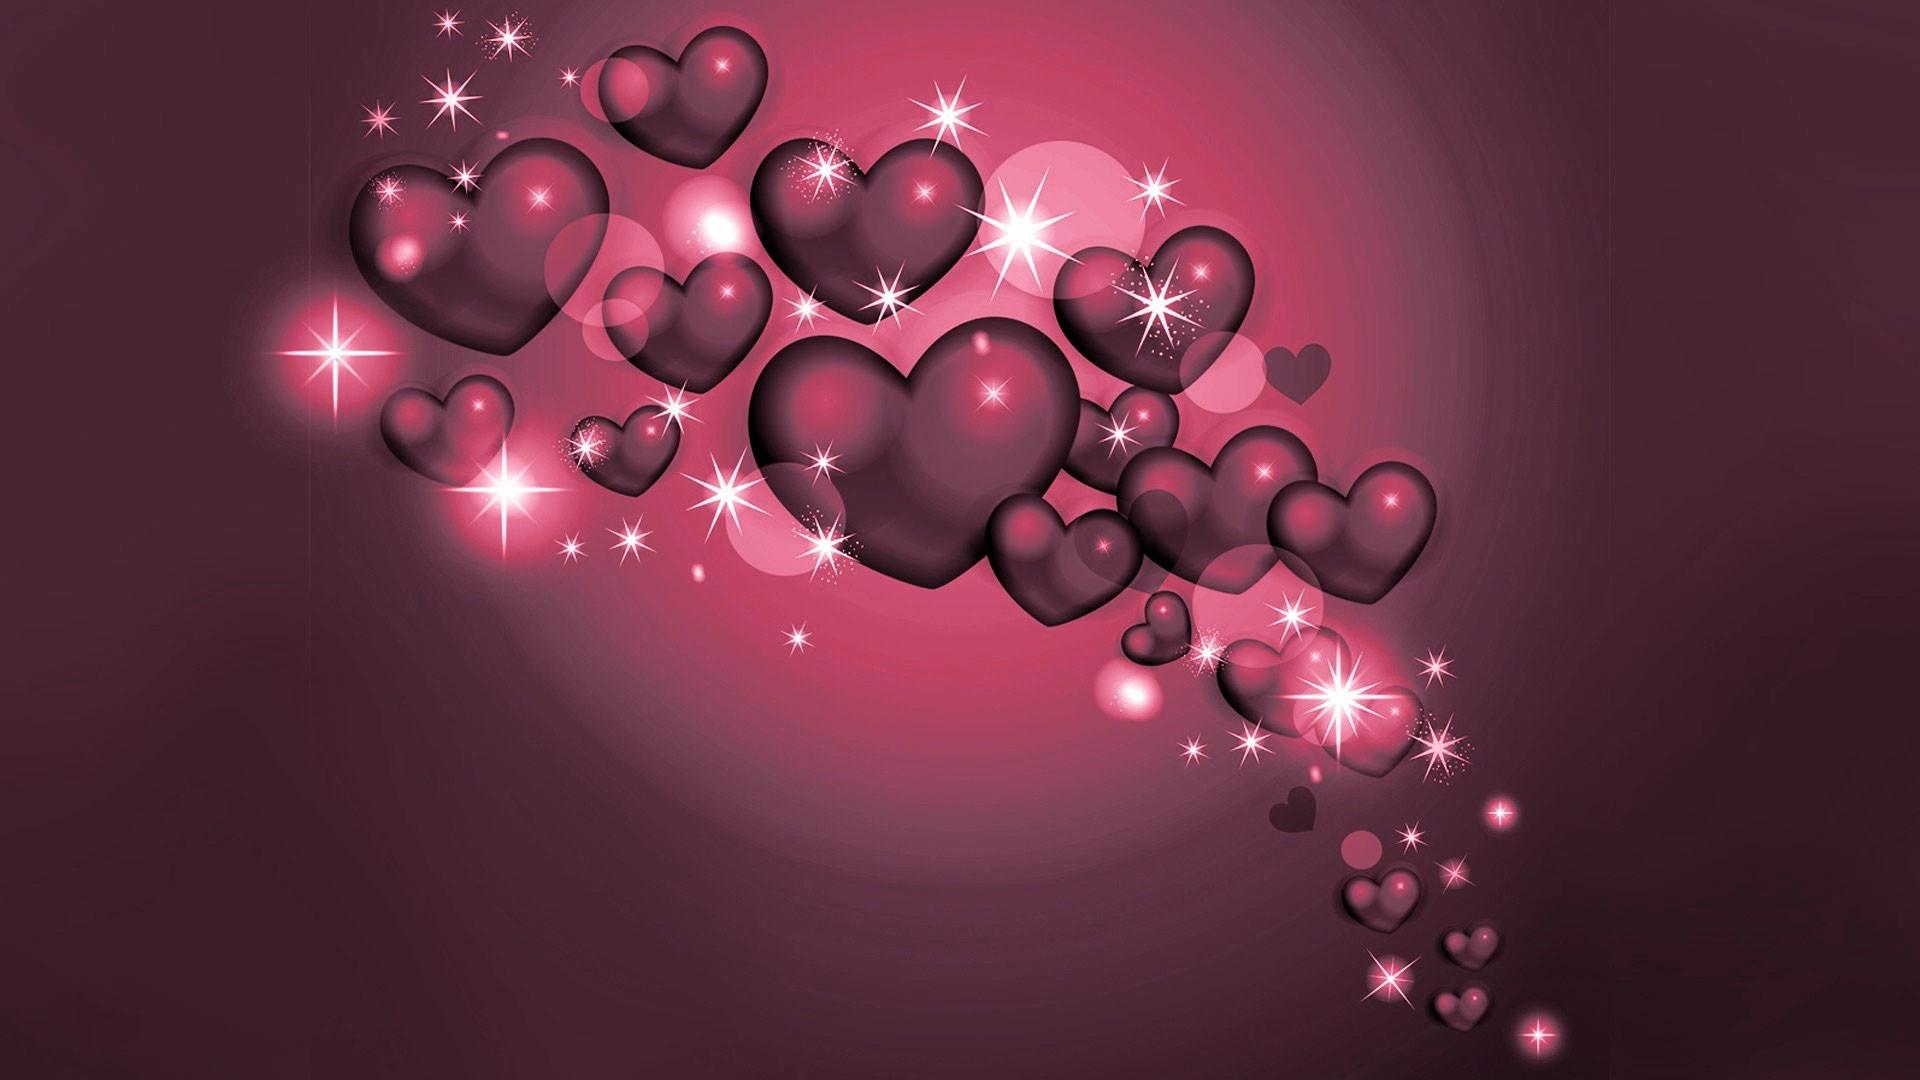 hd pics photos love special glittering cute love hearts desktop background  wallpaper